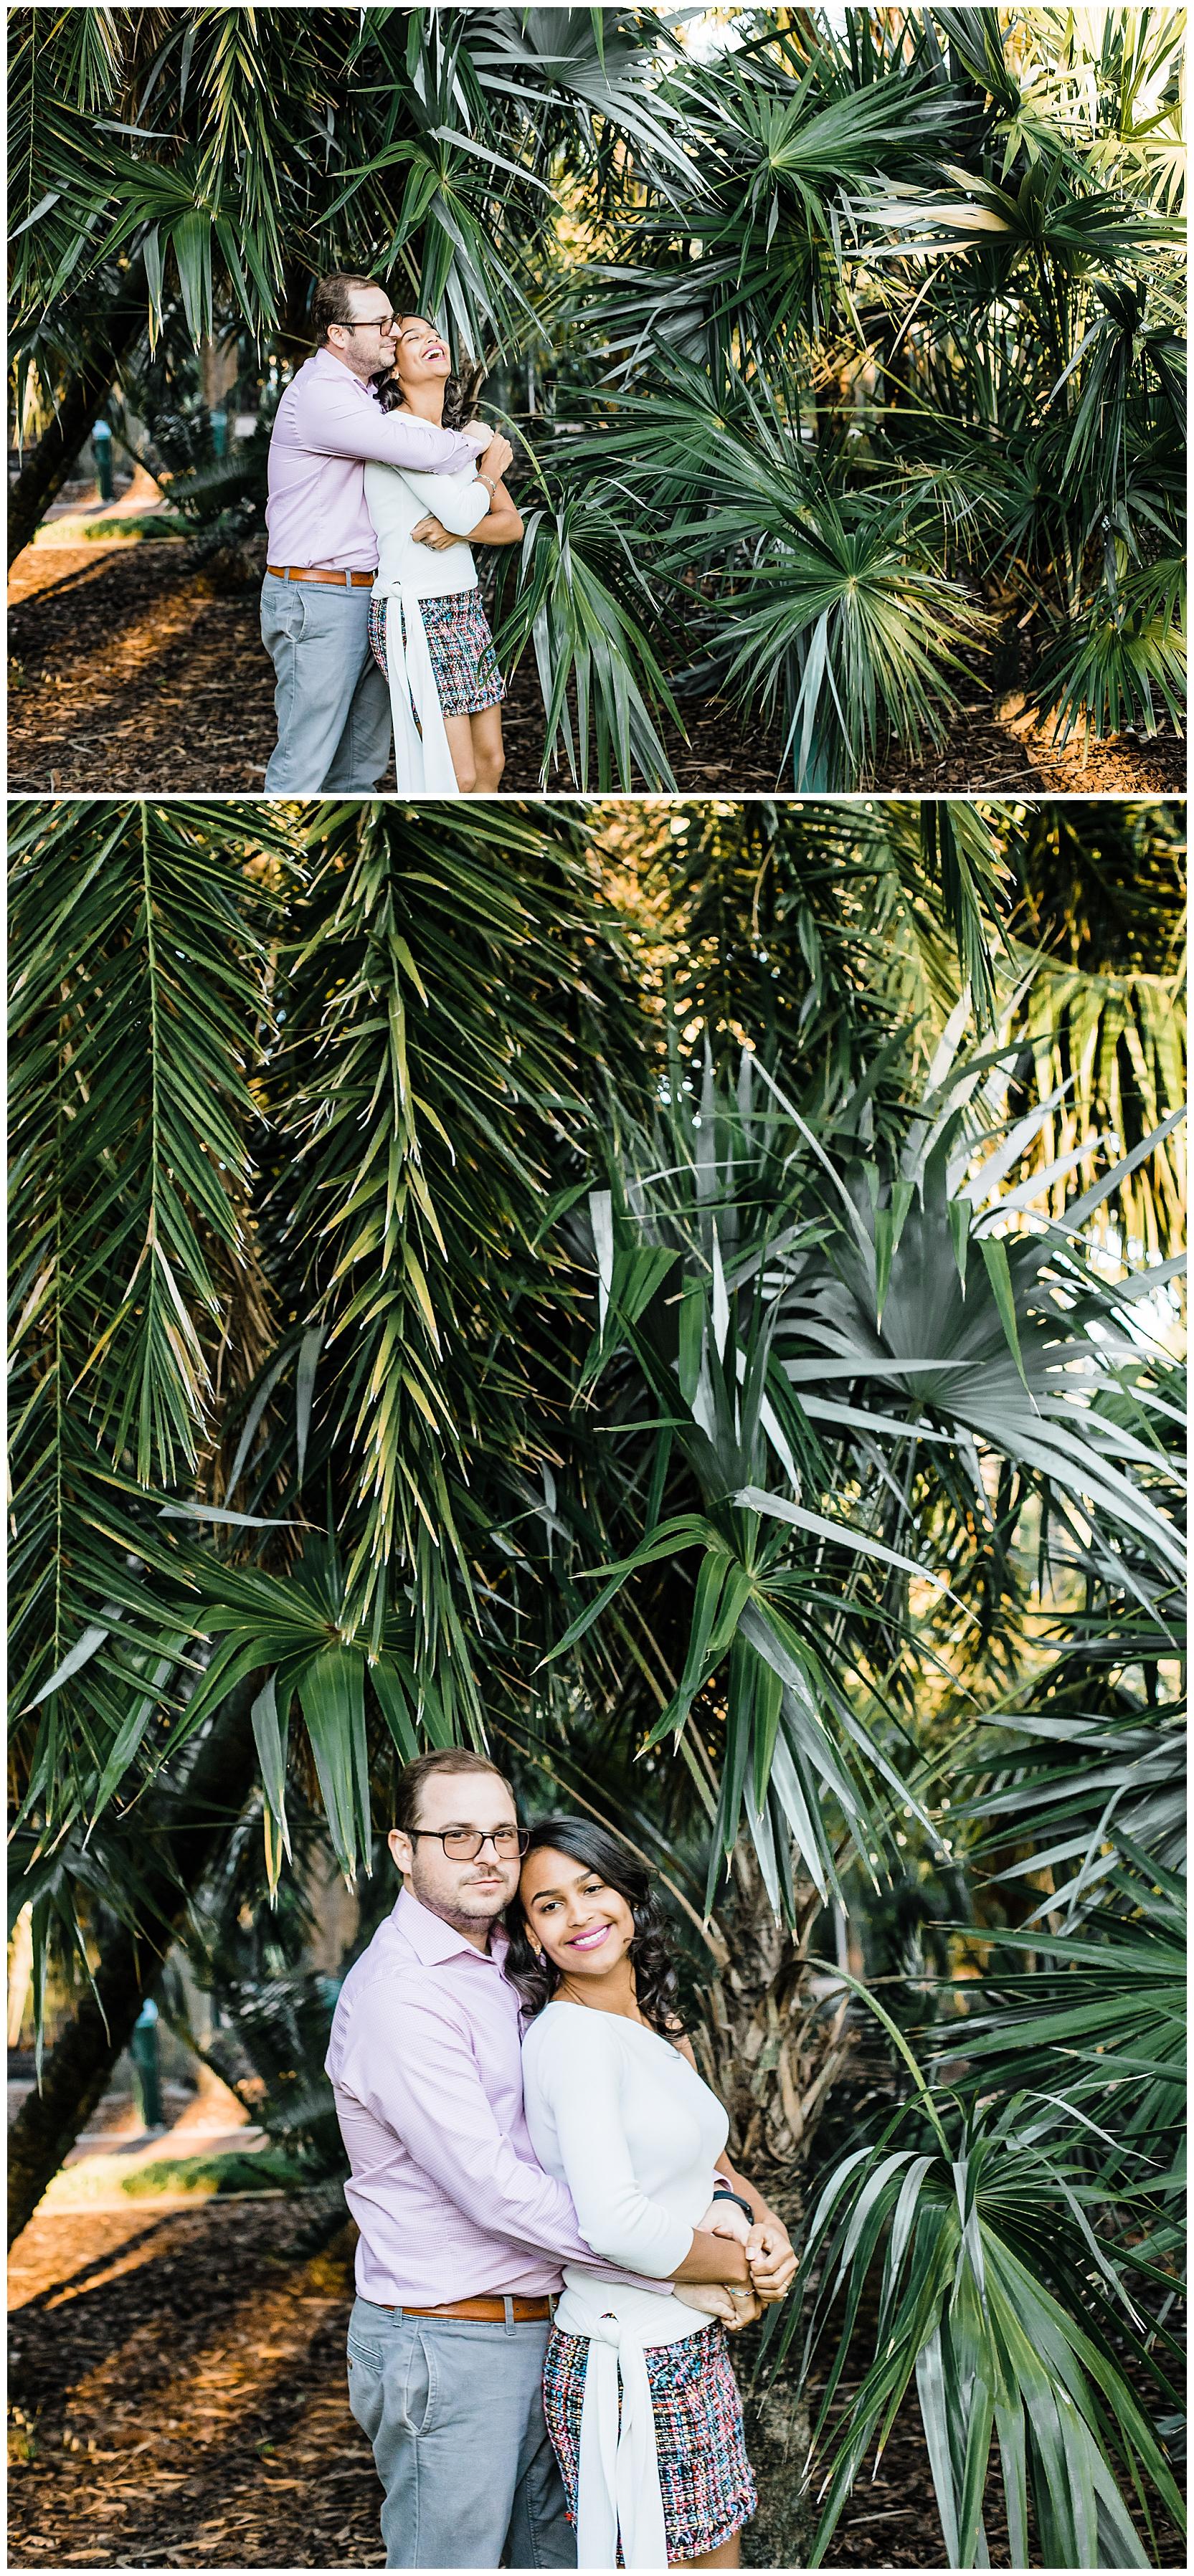 jessicafredericks_st petersburg_florida_downtown_engagement_palm trees_sunset_brewery_0019.jpg